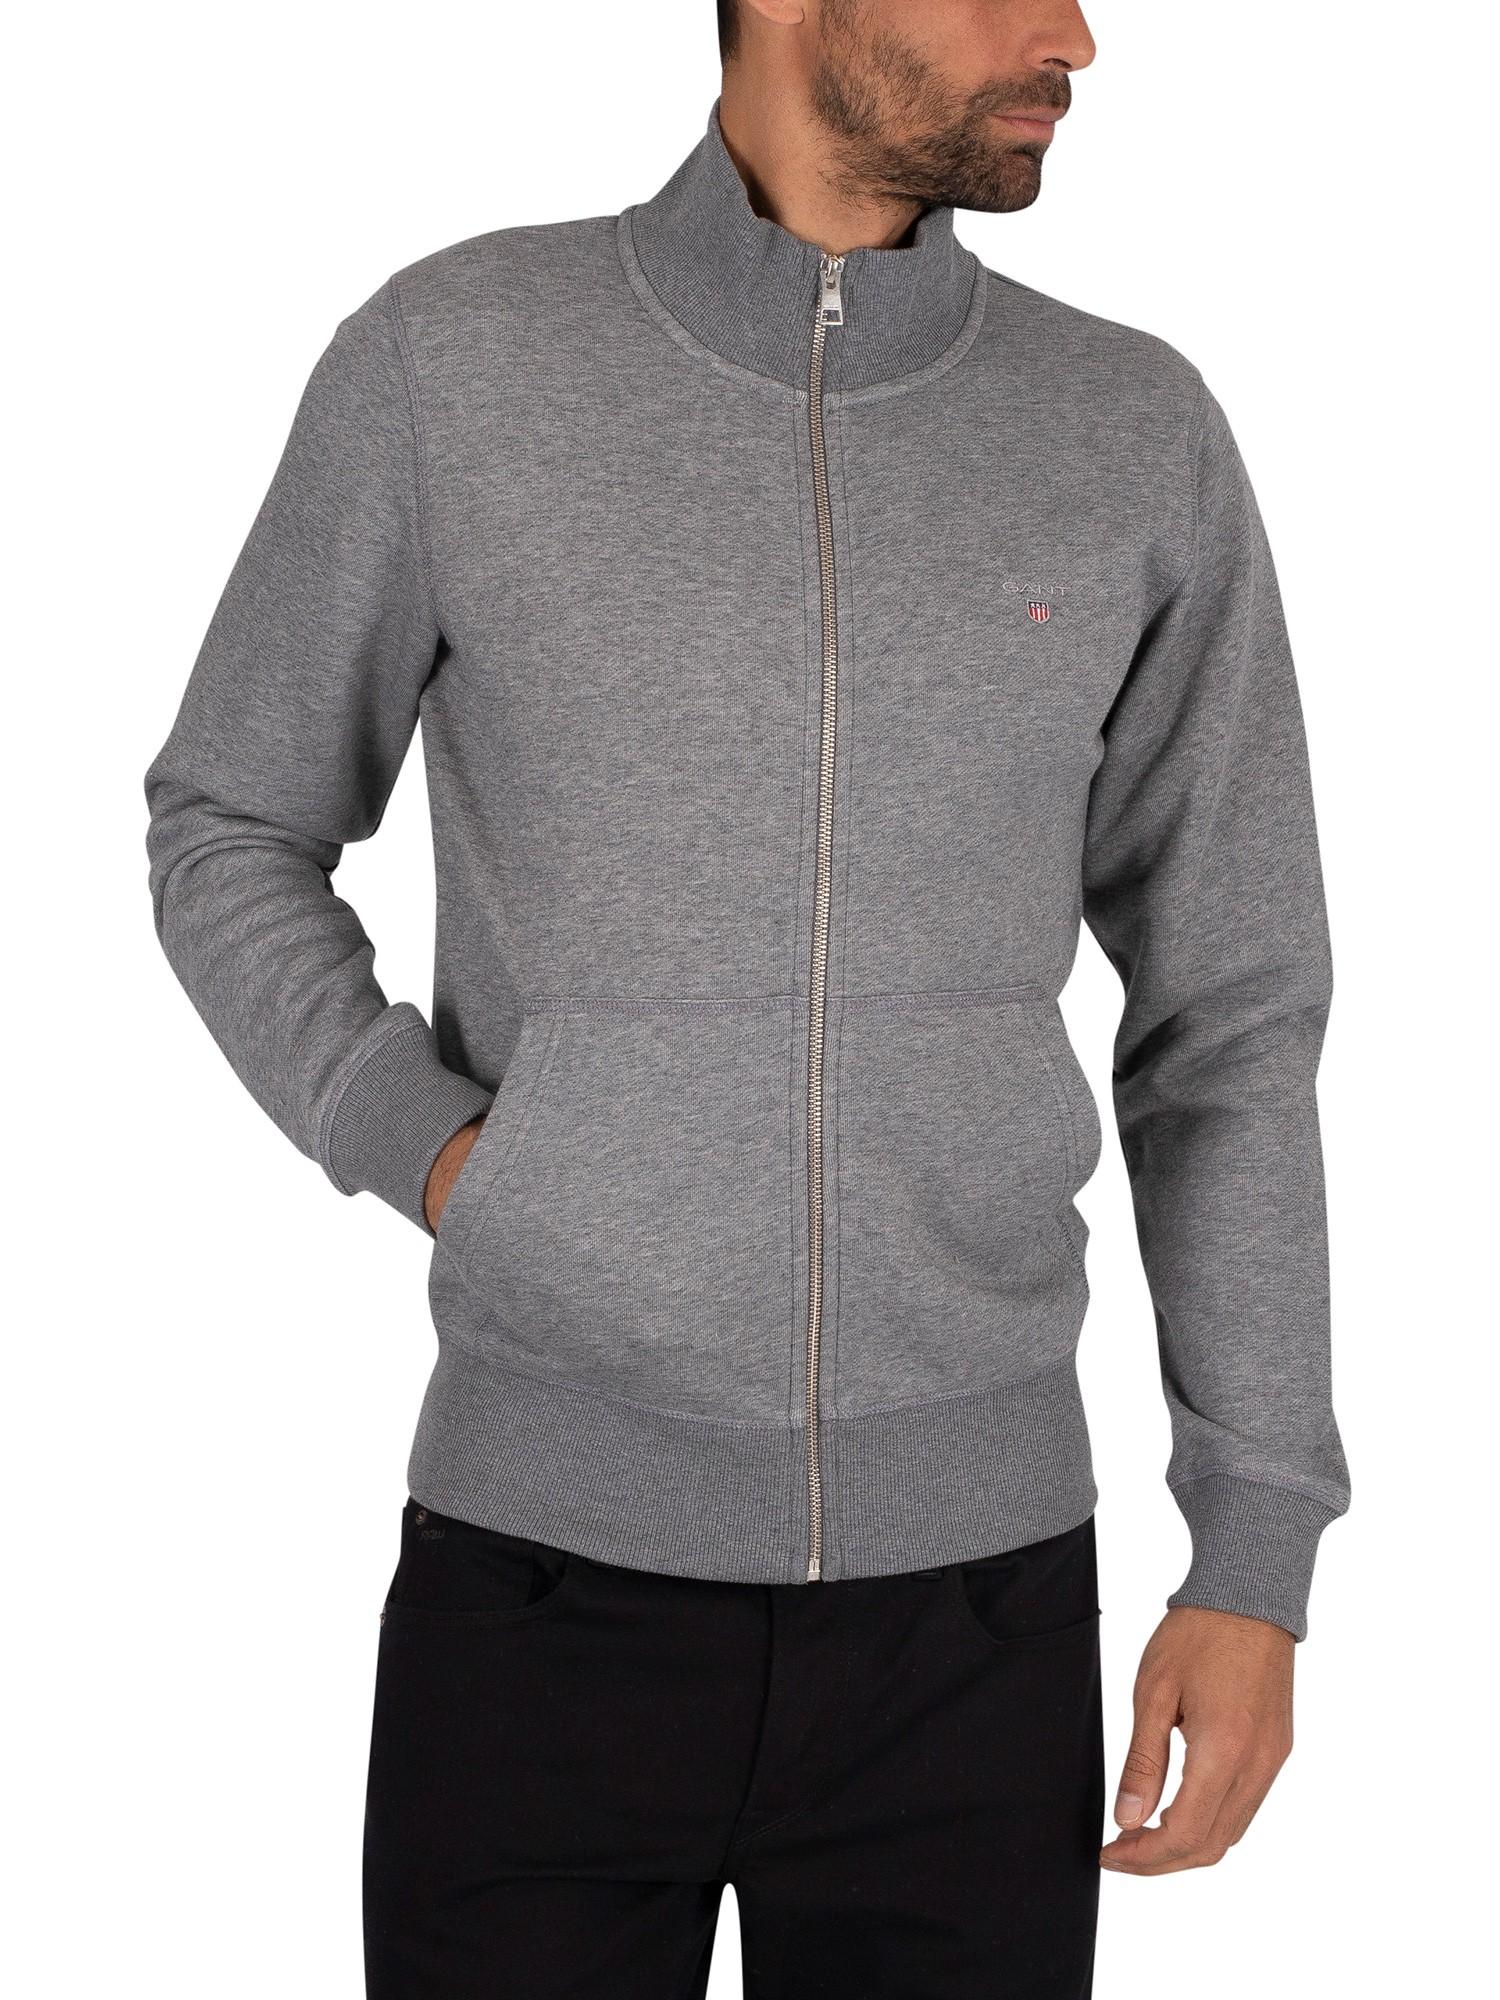 Details zu GANT Herren Original Zip Sweatshirt, Grau